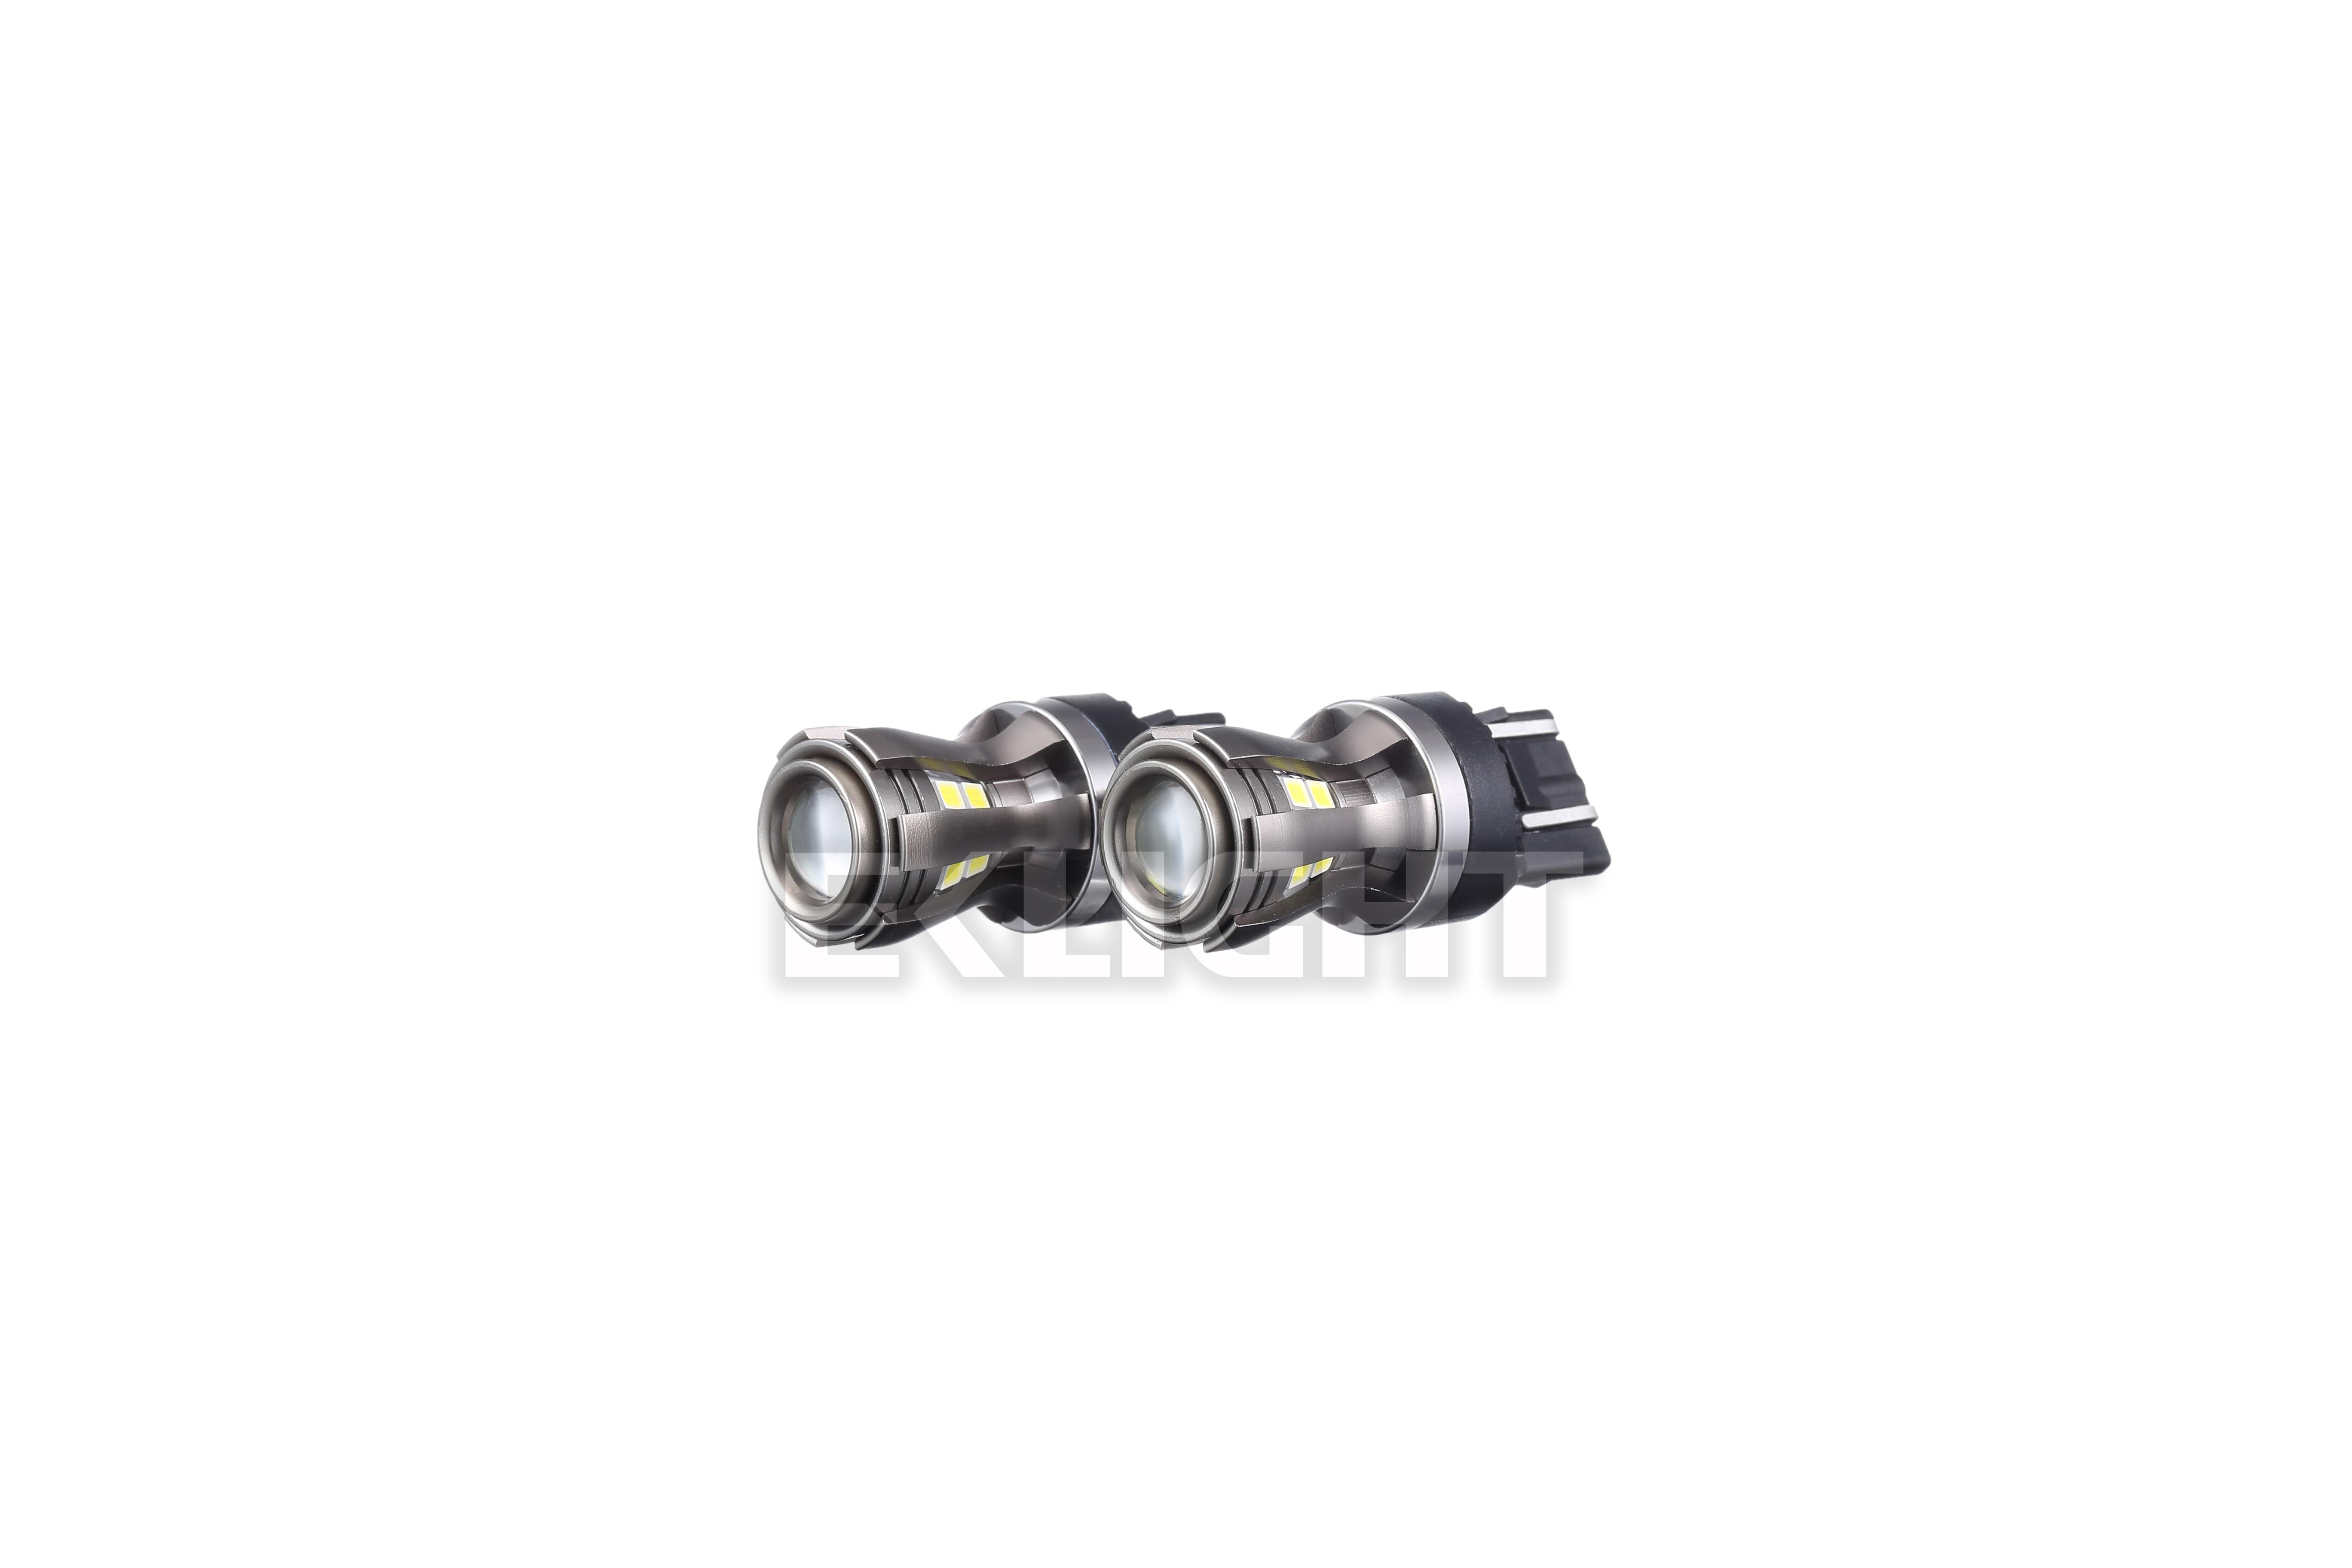 High power 7443 LED stoplight brake light Featured Image